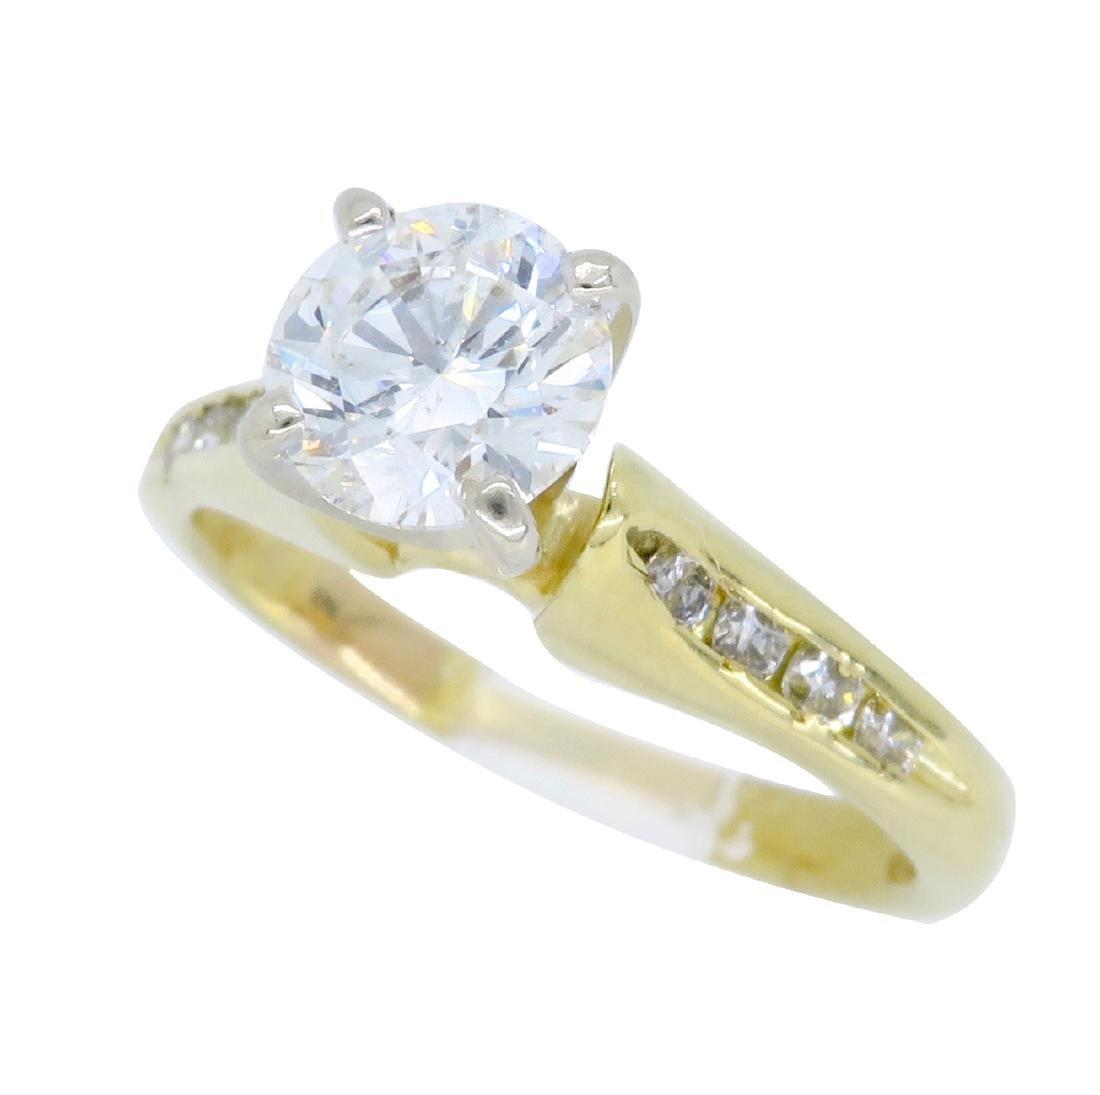 18KT Yellow gold 0.79ctw Diamond Ring